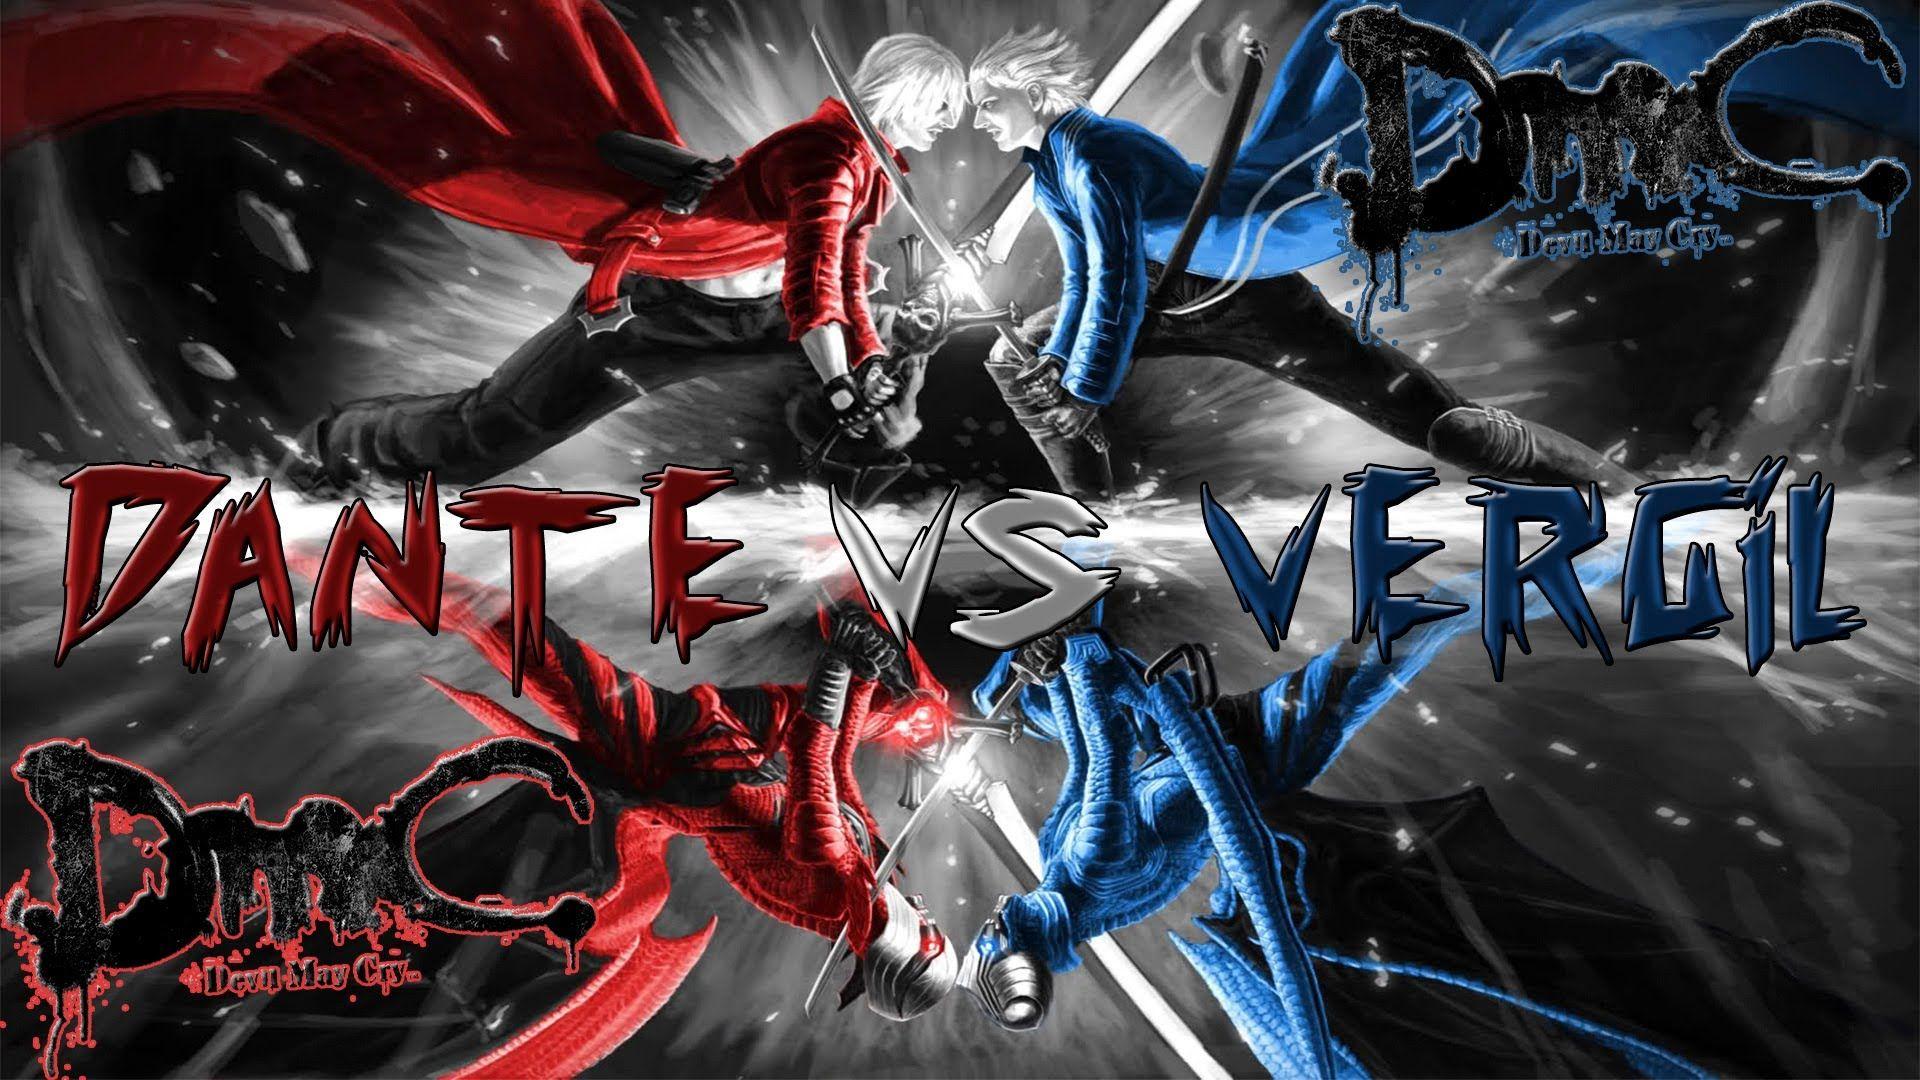 Devil may cry 5 dante devil may cry 5 dante vs vergil anime devil may cry 5 dante devil may cry 5 dante vs vergil anime genre voltagebd Image collections